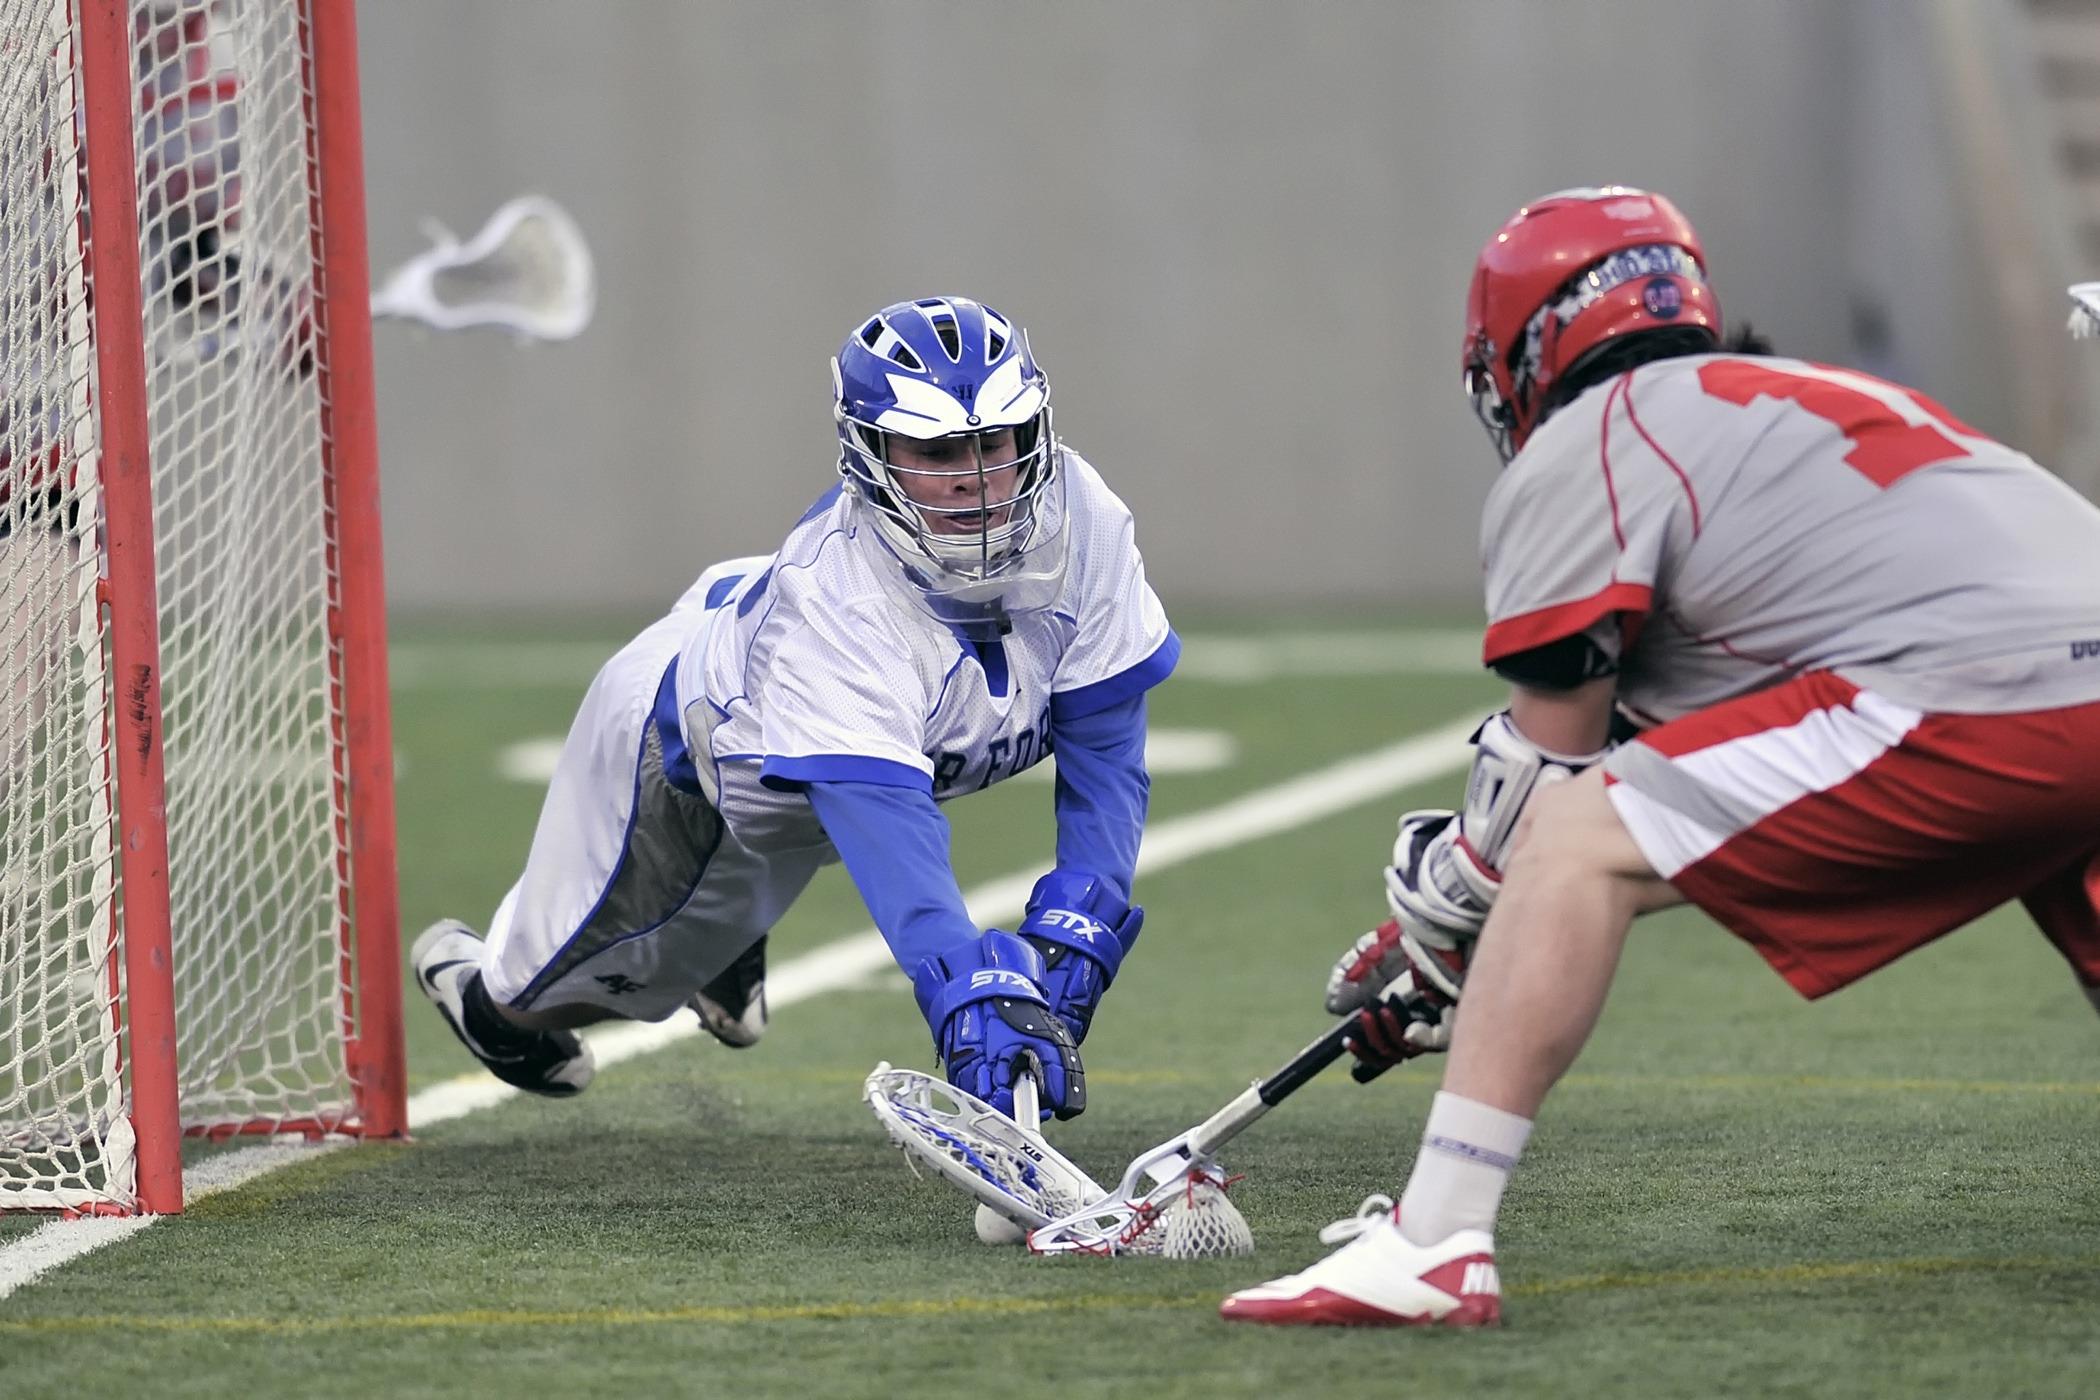 lacrosse-air-force-ohio-state-game-67870.jpg